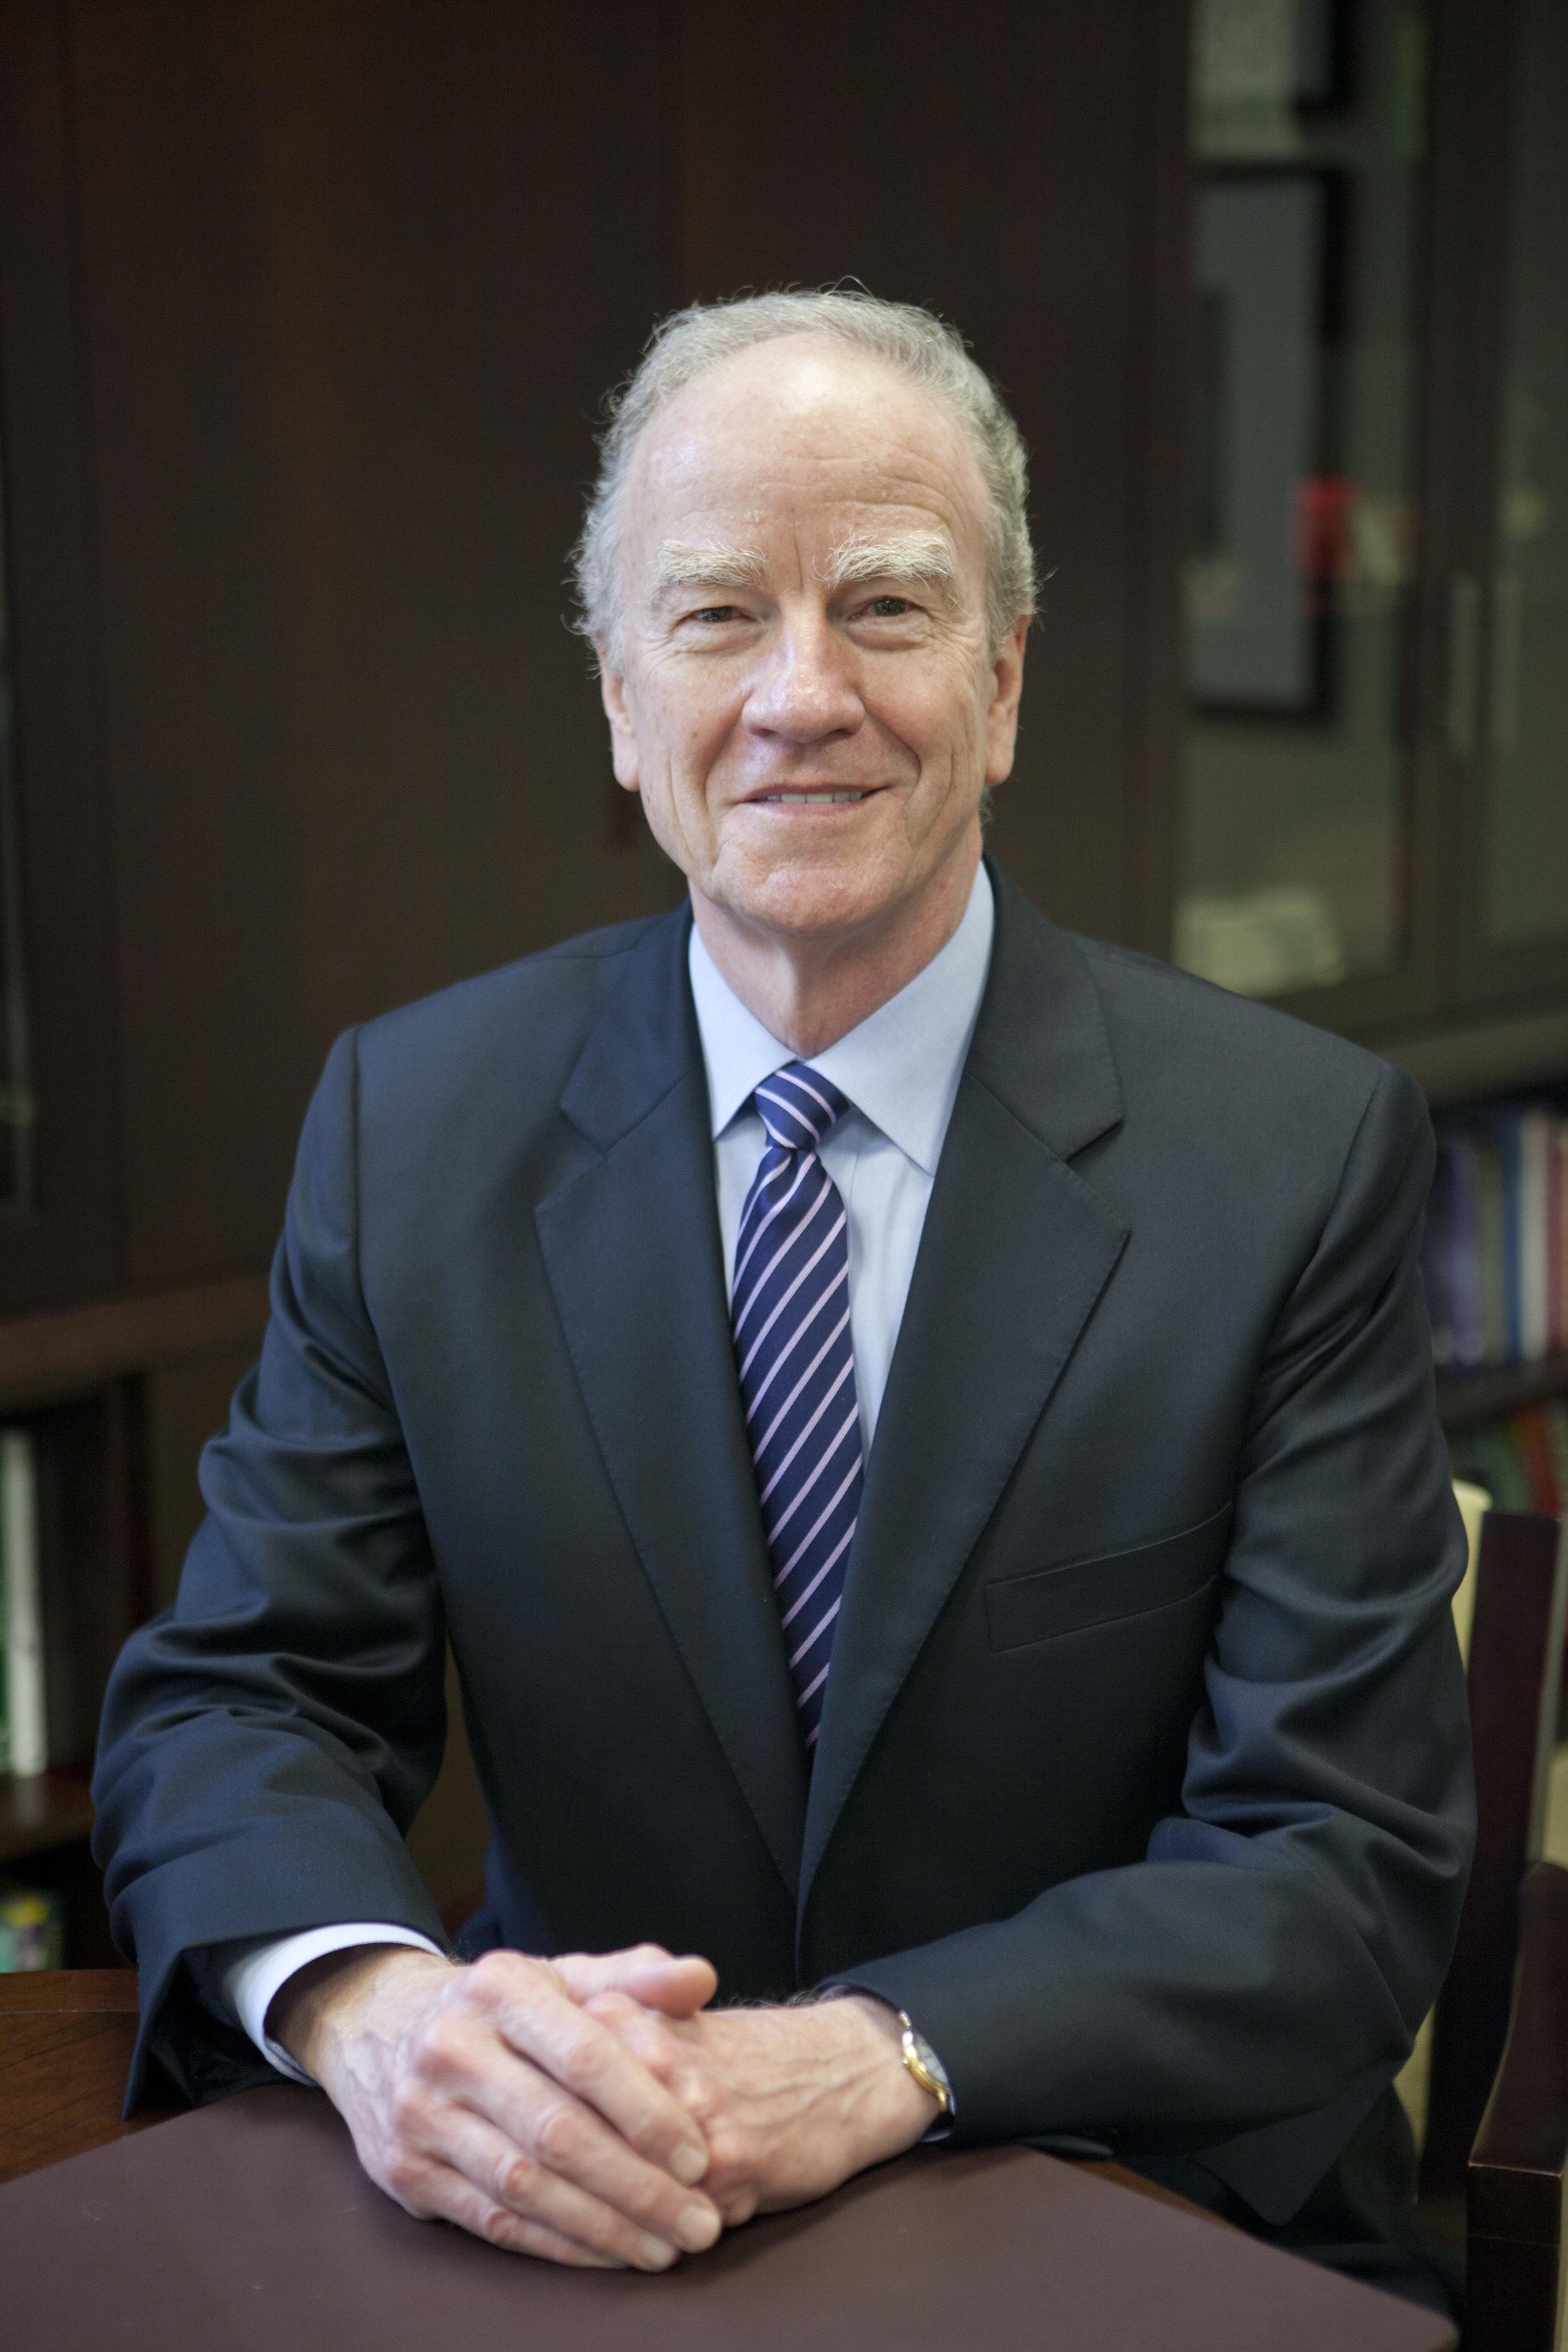 Dr. George Martin, President, St. Edward's University